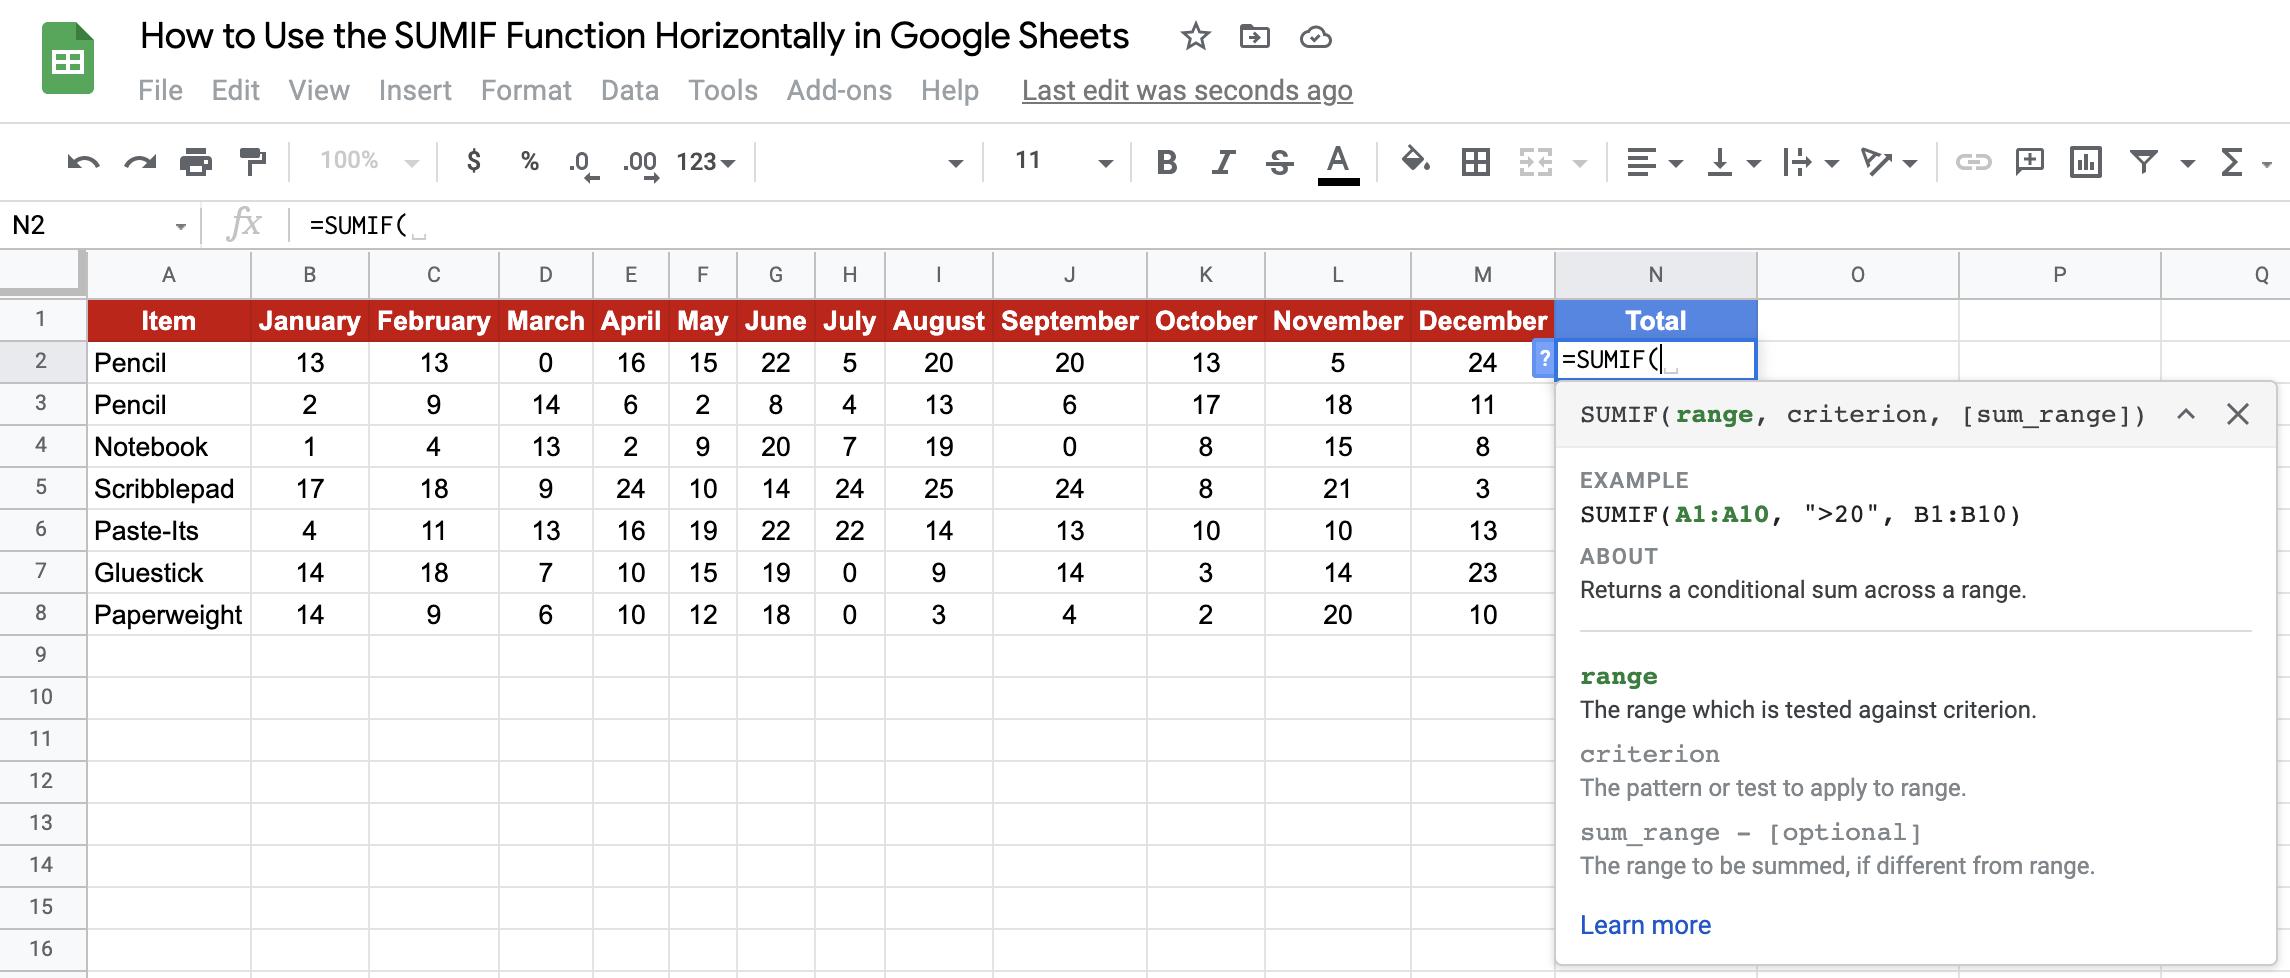 Horizontal SUMIF in Google Sheets